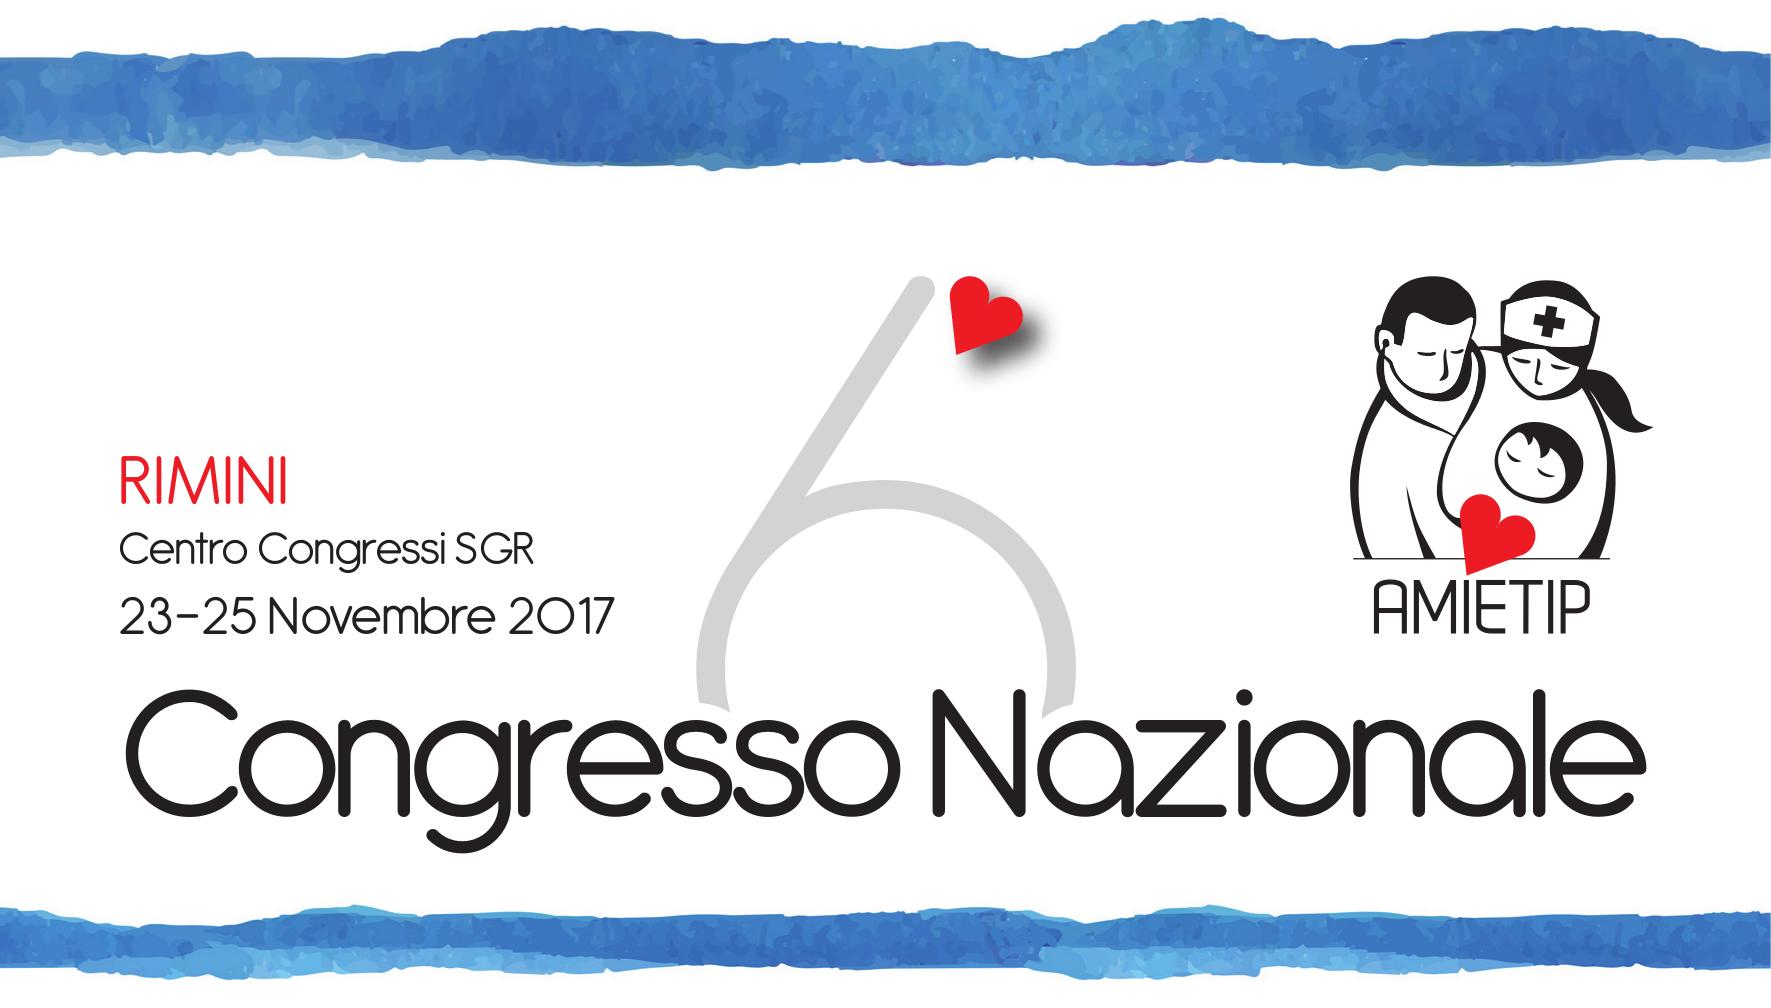 6° Congresso Nazionale AMIETIP 2017